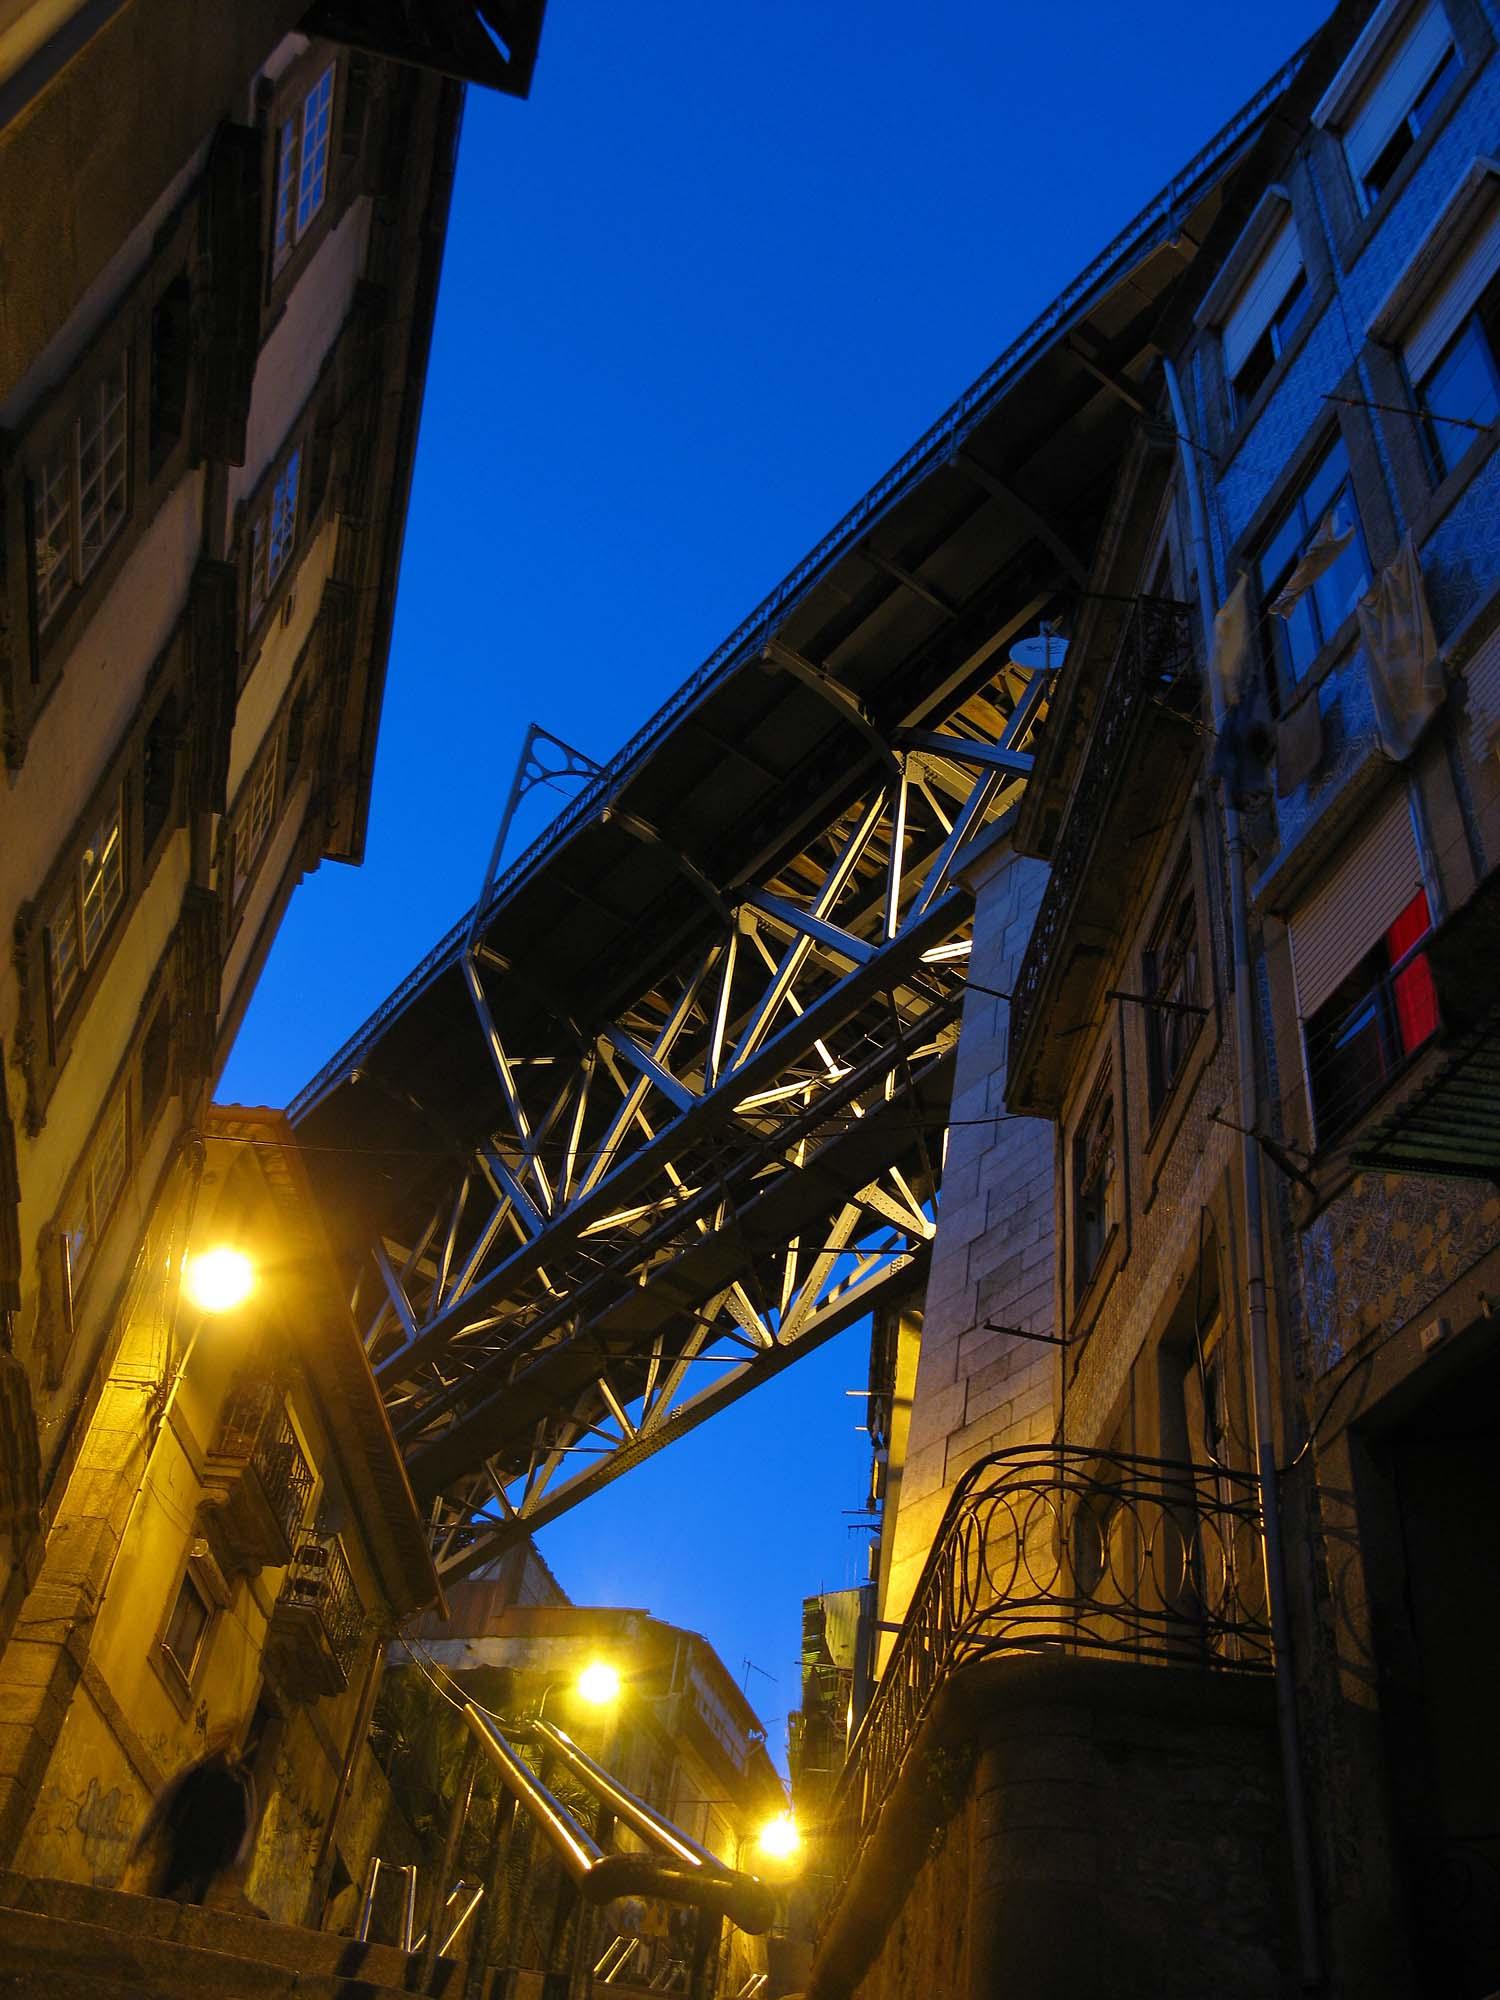 portugal-2010-bruecke-blaue-stunde-small